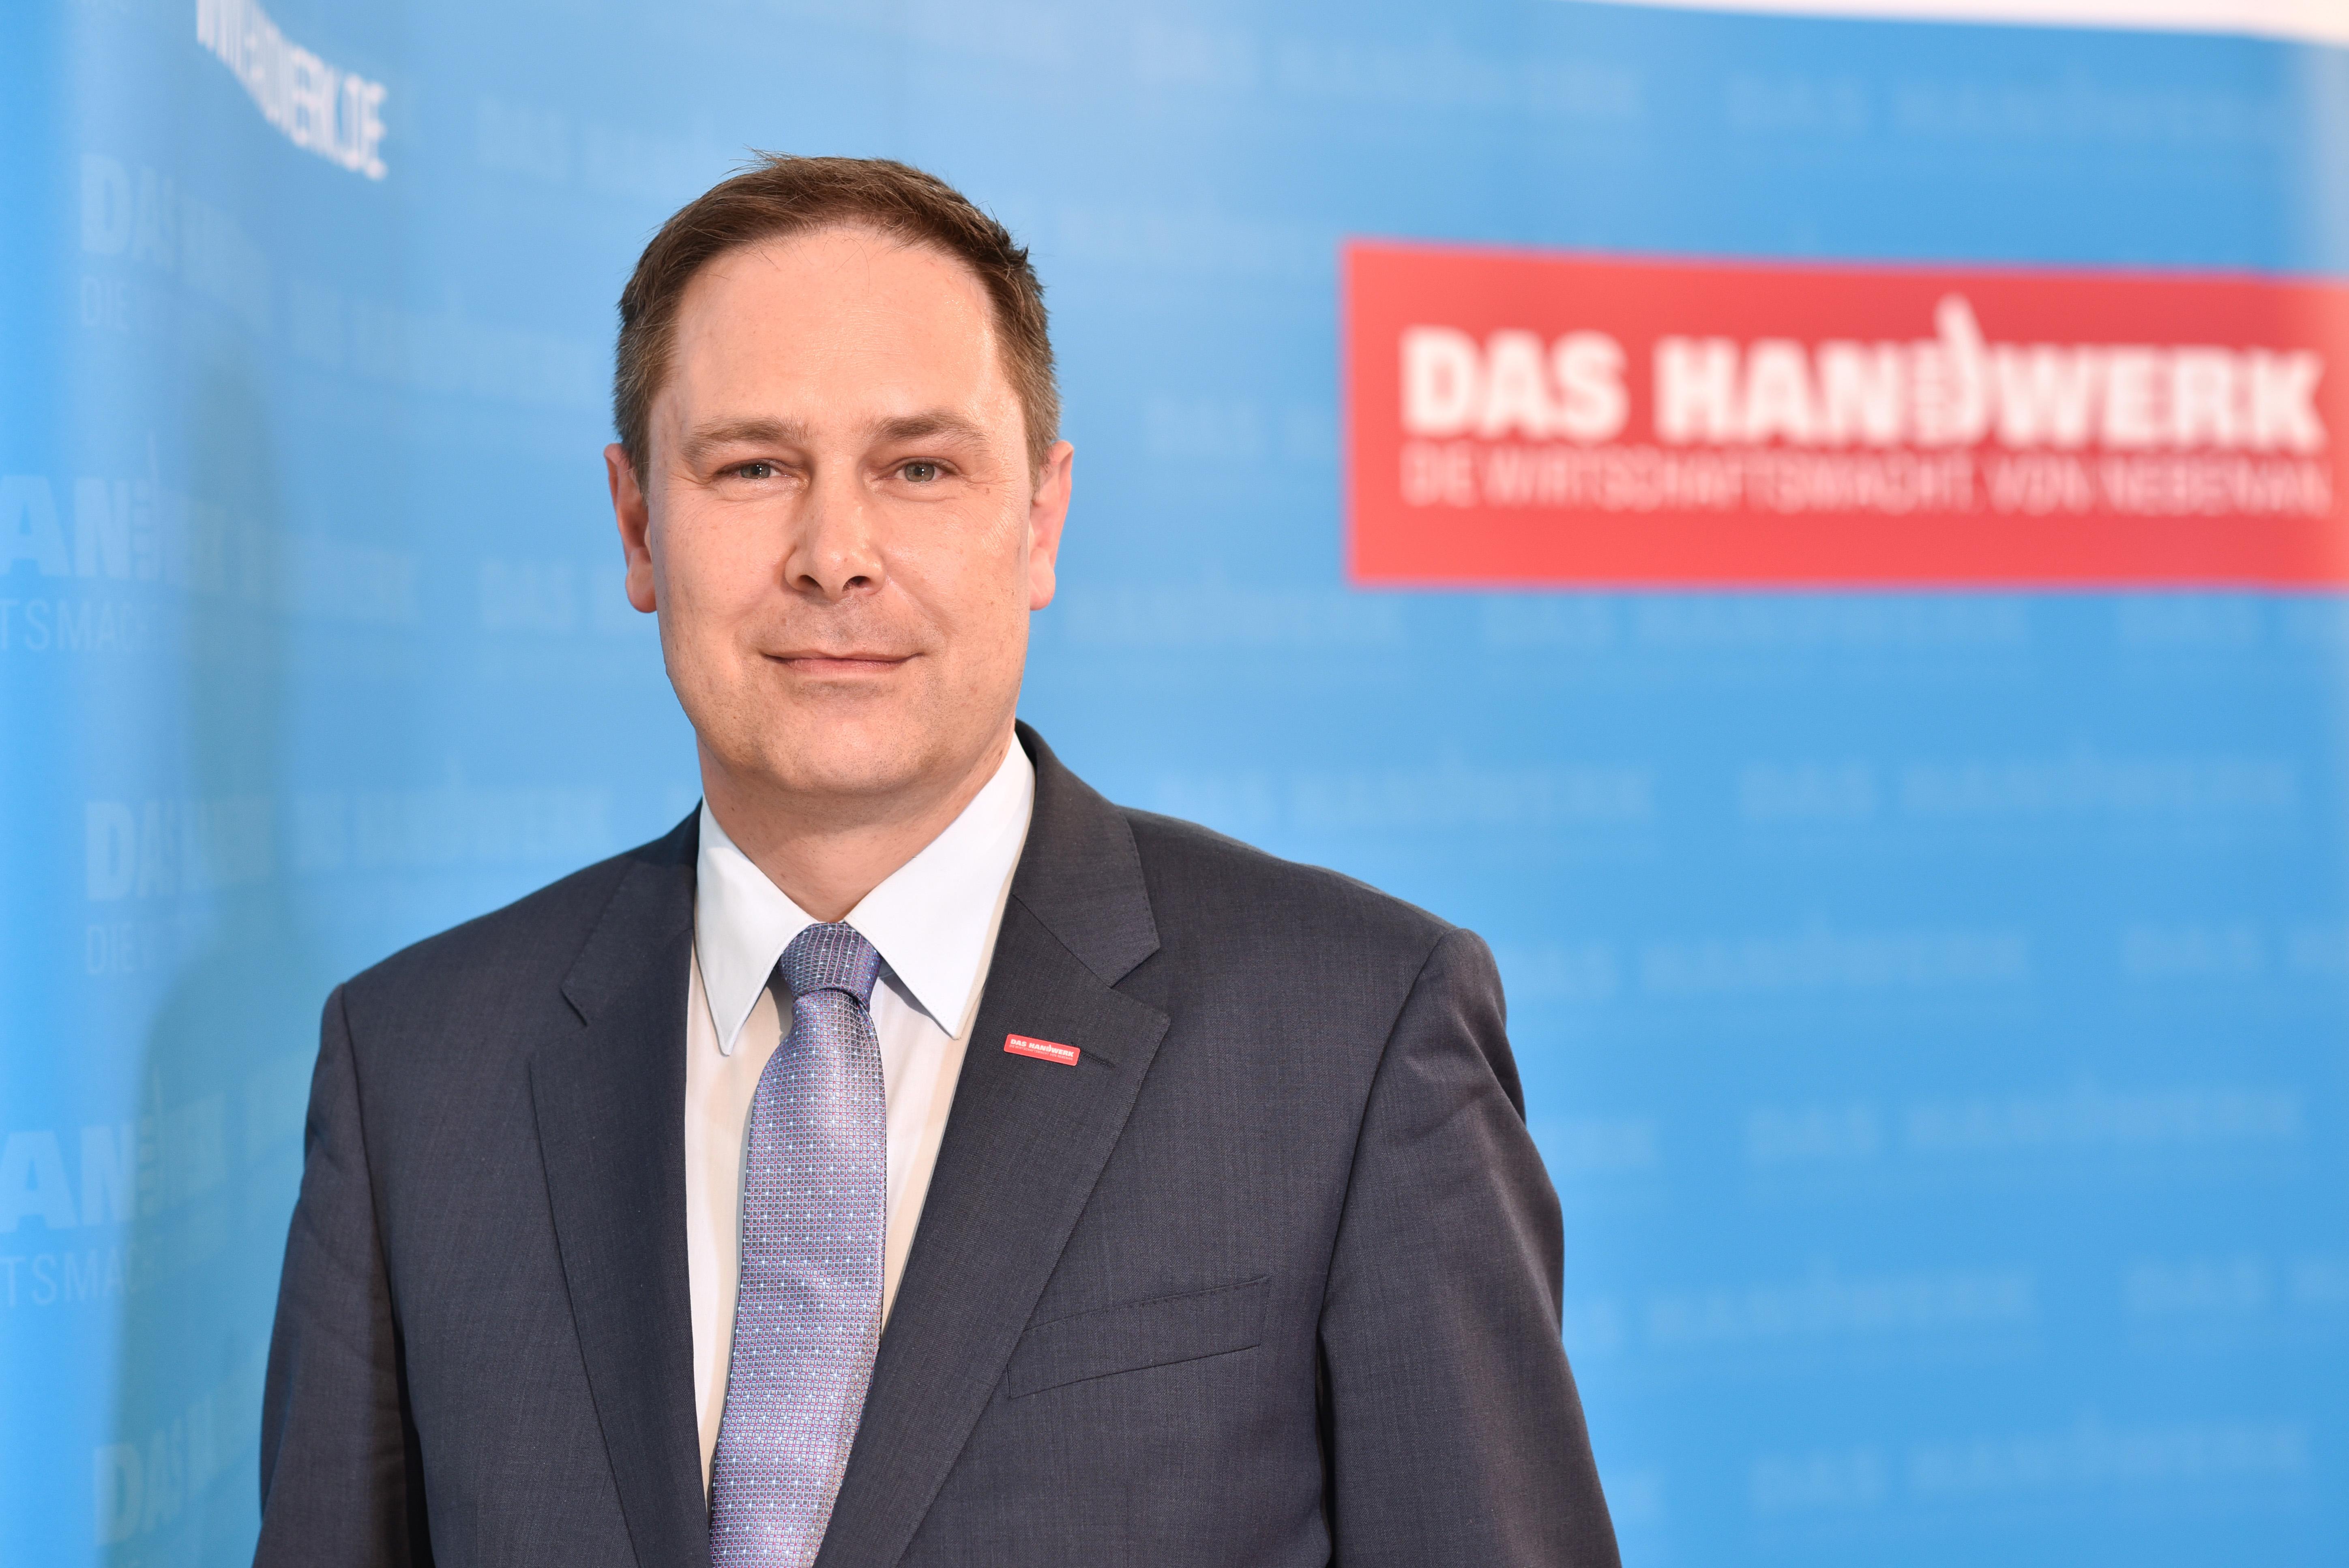 Karl-Sebastian Schulte